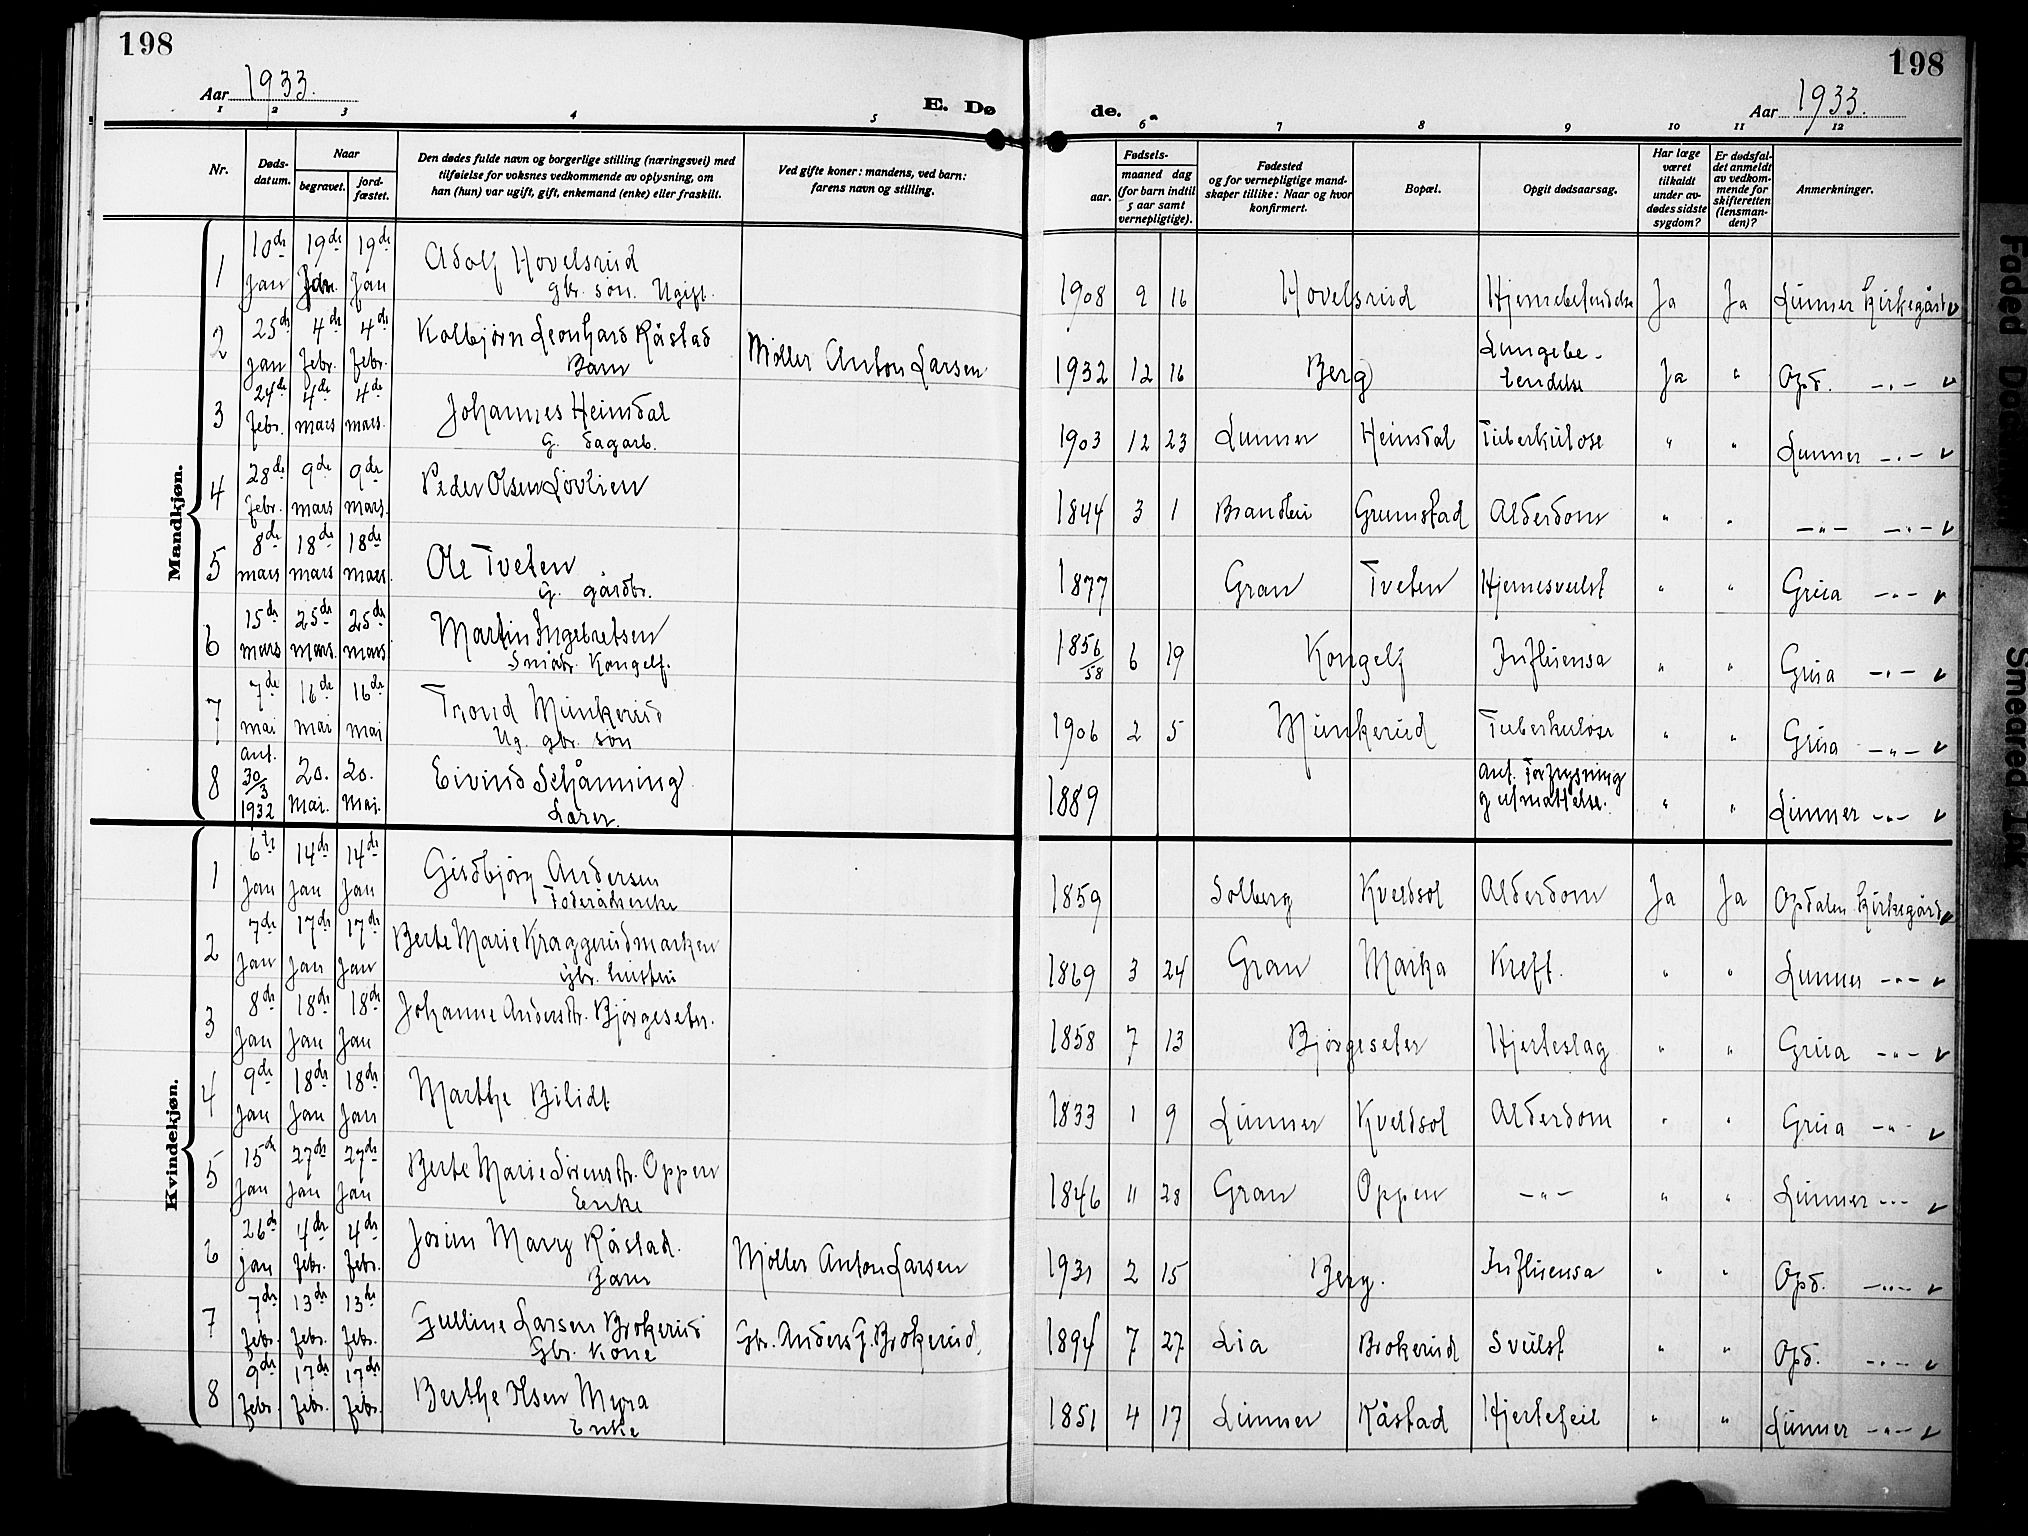 SAH, Lunner prestekontor, H/Ha/Hab/L0002: Klokkerbok nr. 2, 1923-1933, s. 198